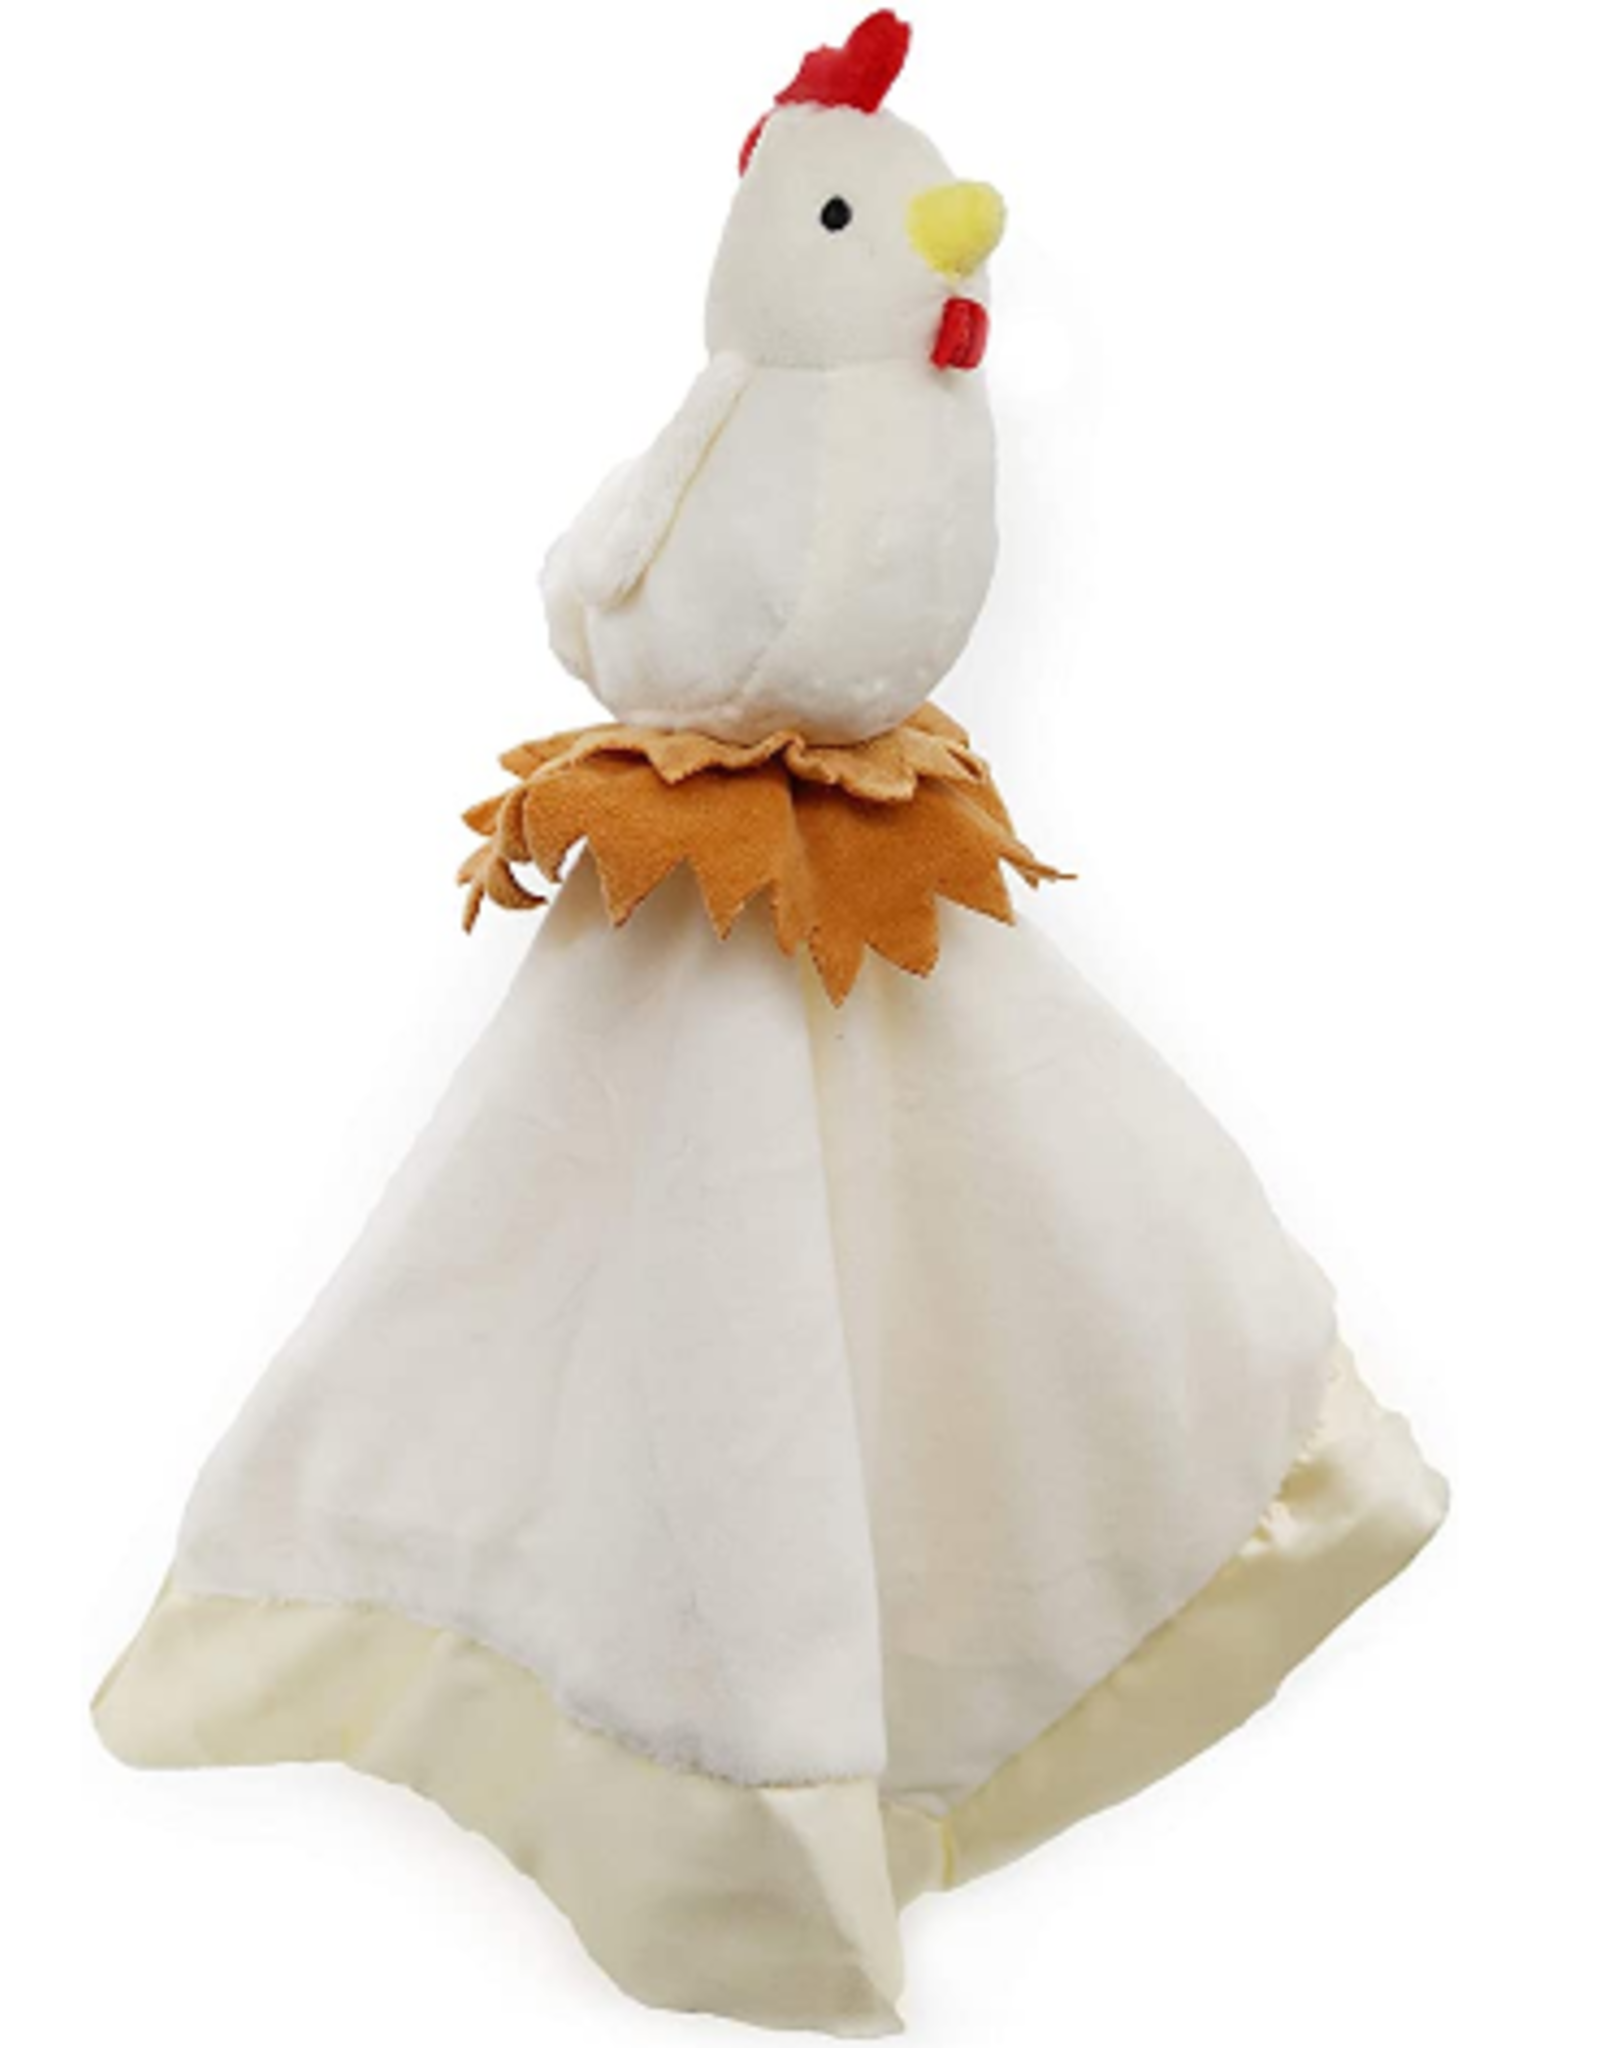 Wink Peep the Chicken Lovey